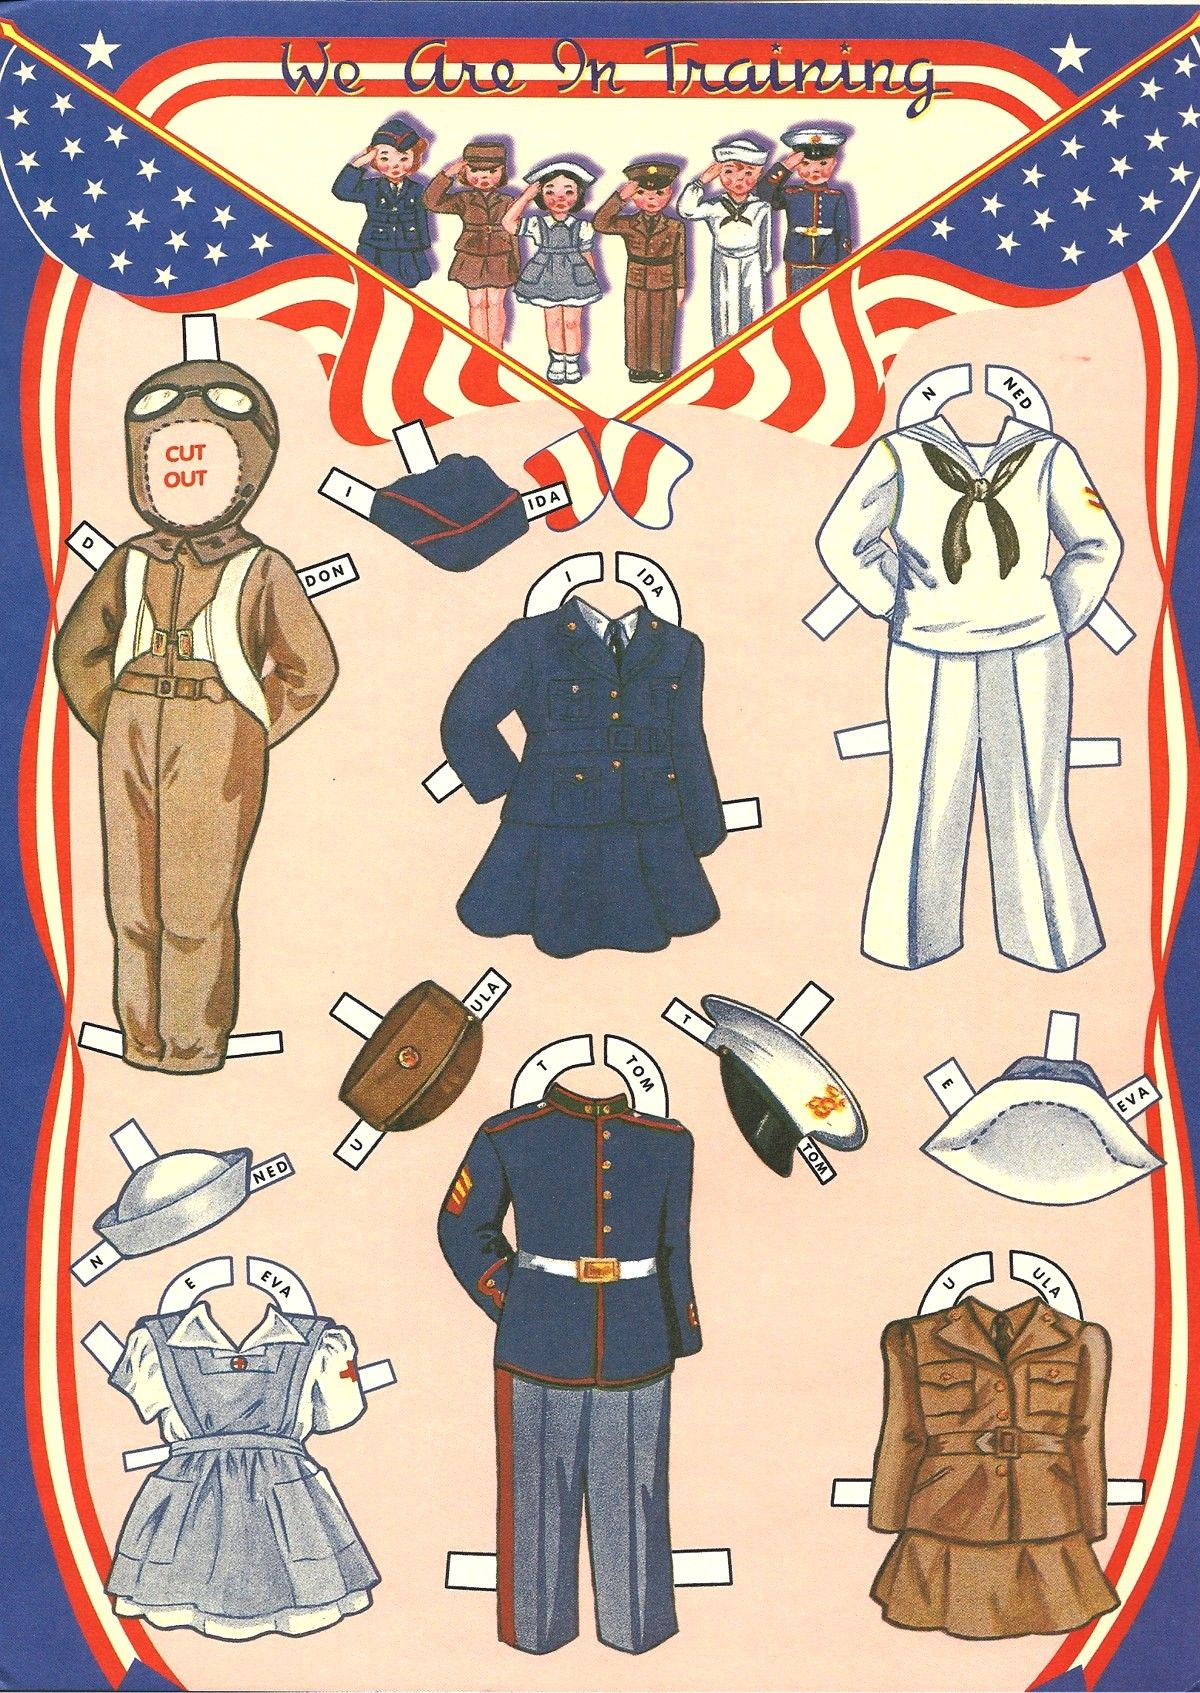 Patriotic Paper Dolls image by Susan McEntire Paper